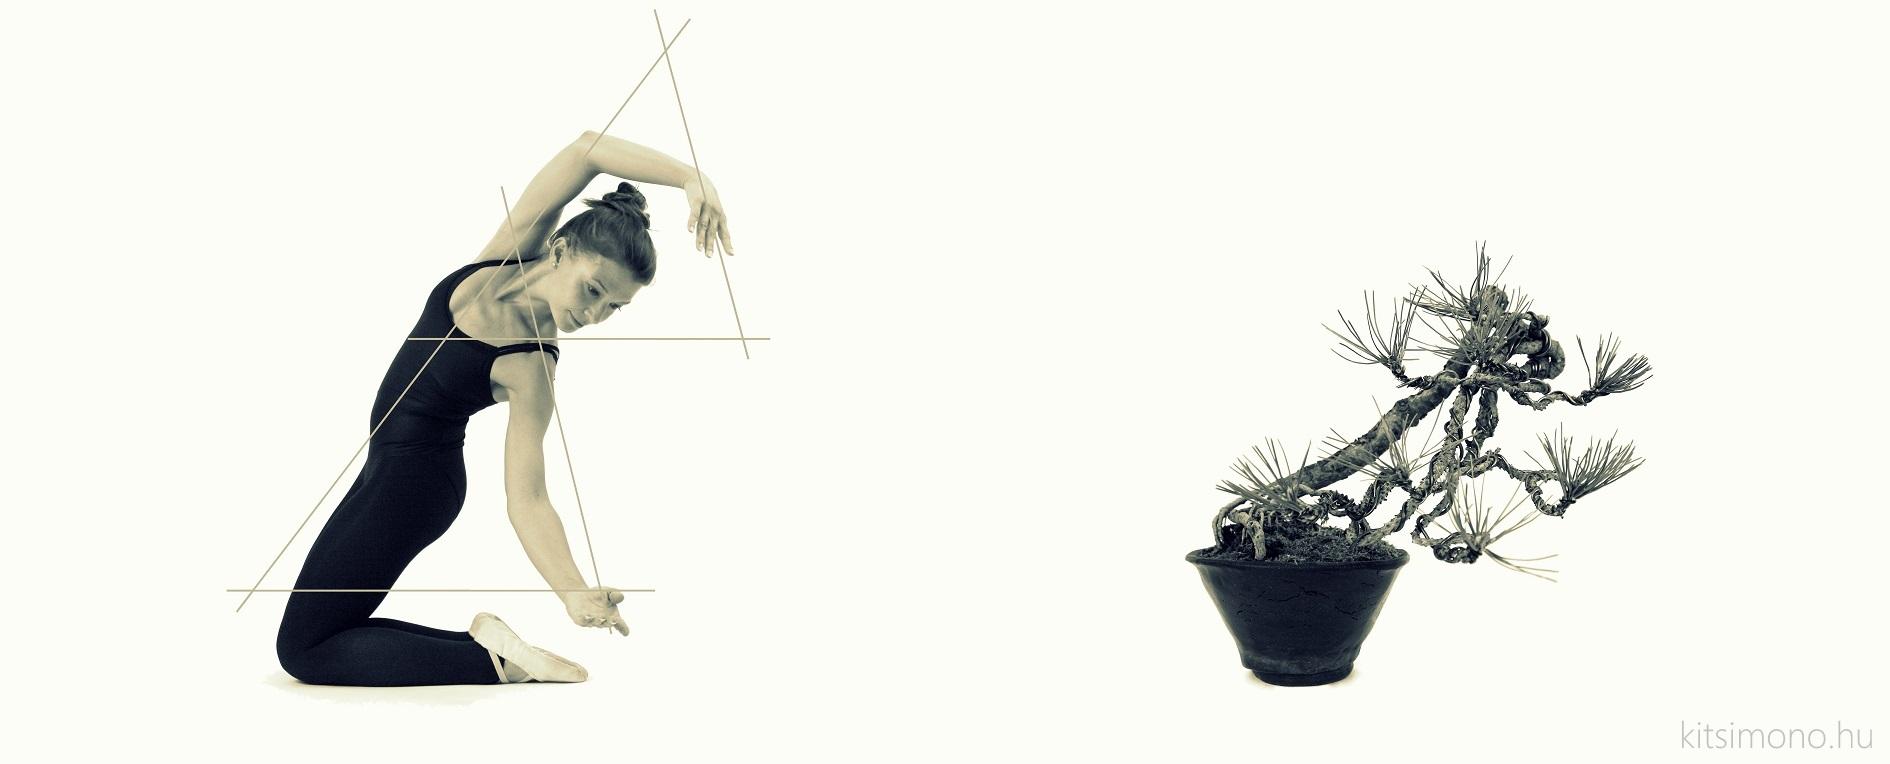 pinus bunjin black pine in jingasa pot and ballet dance (1)